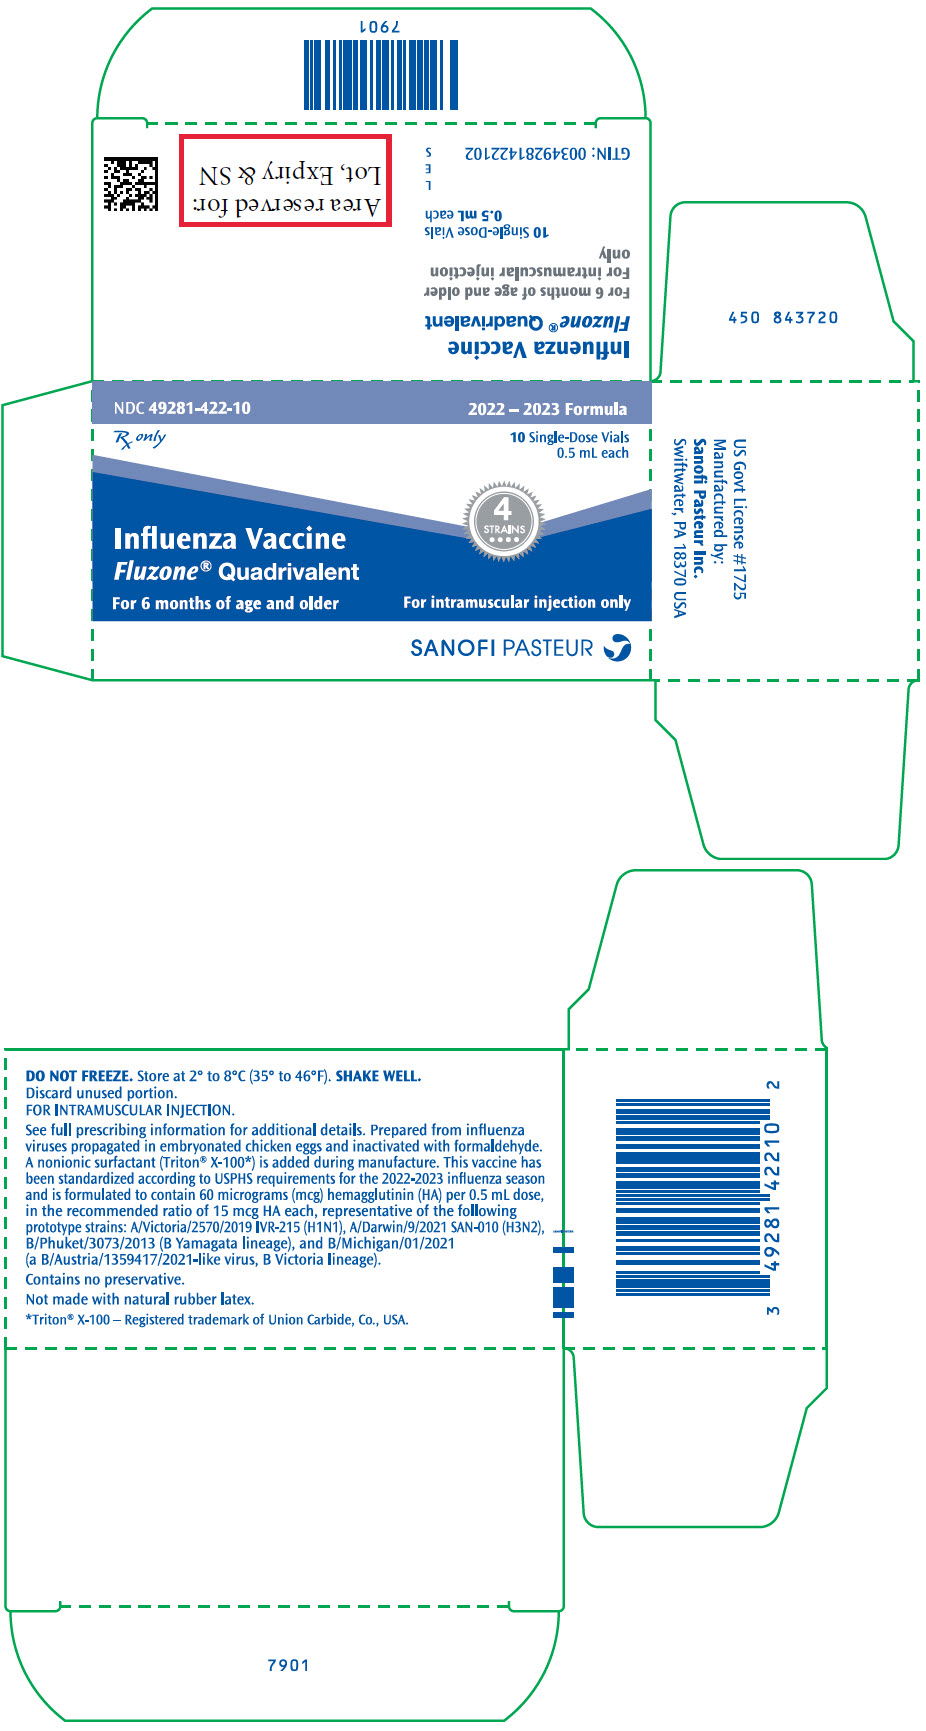 RX ITEM-FLUZONE QUAD SF 10X0.5ML 2019-20  By Sanofi Pasteur